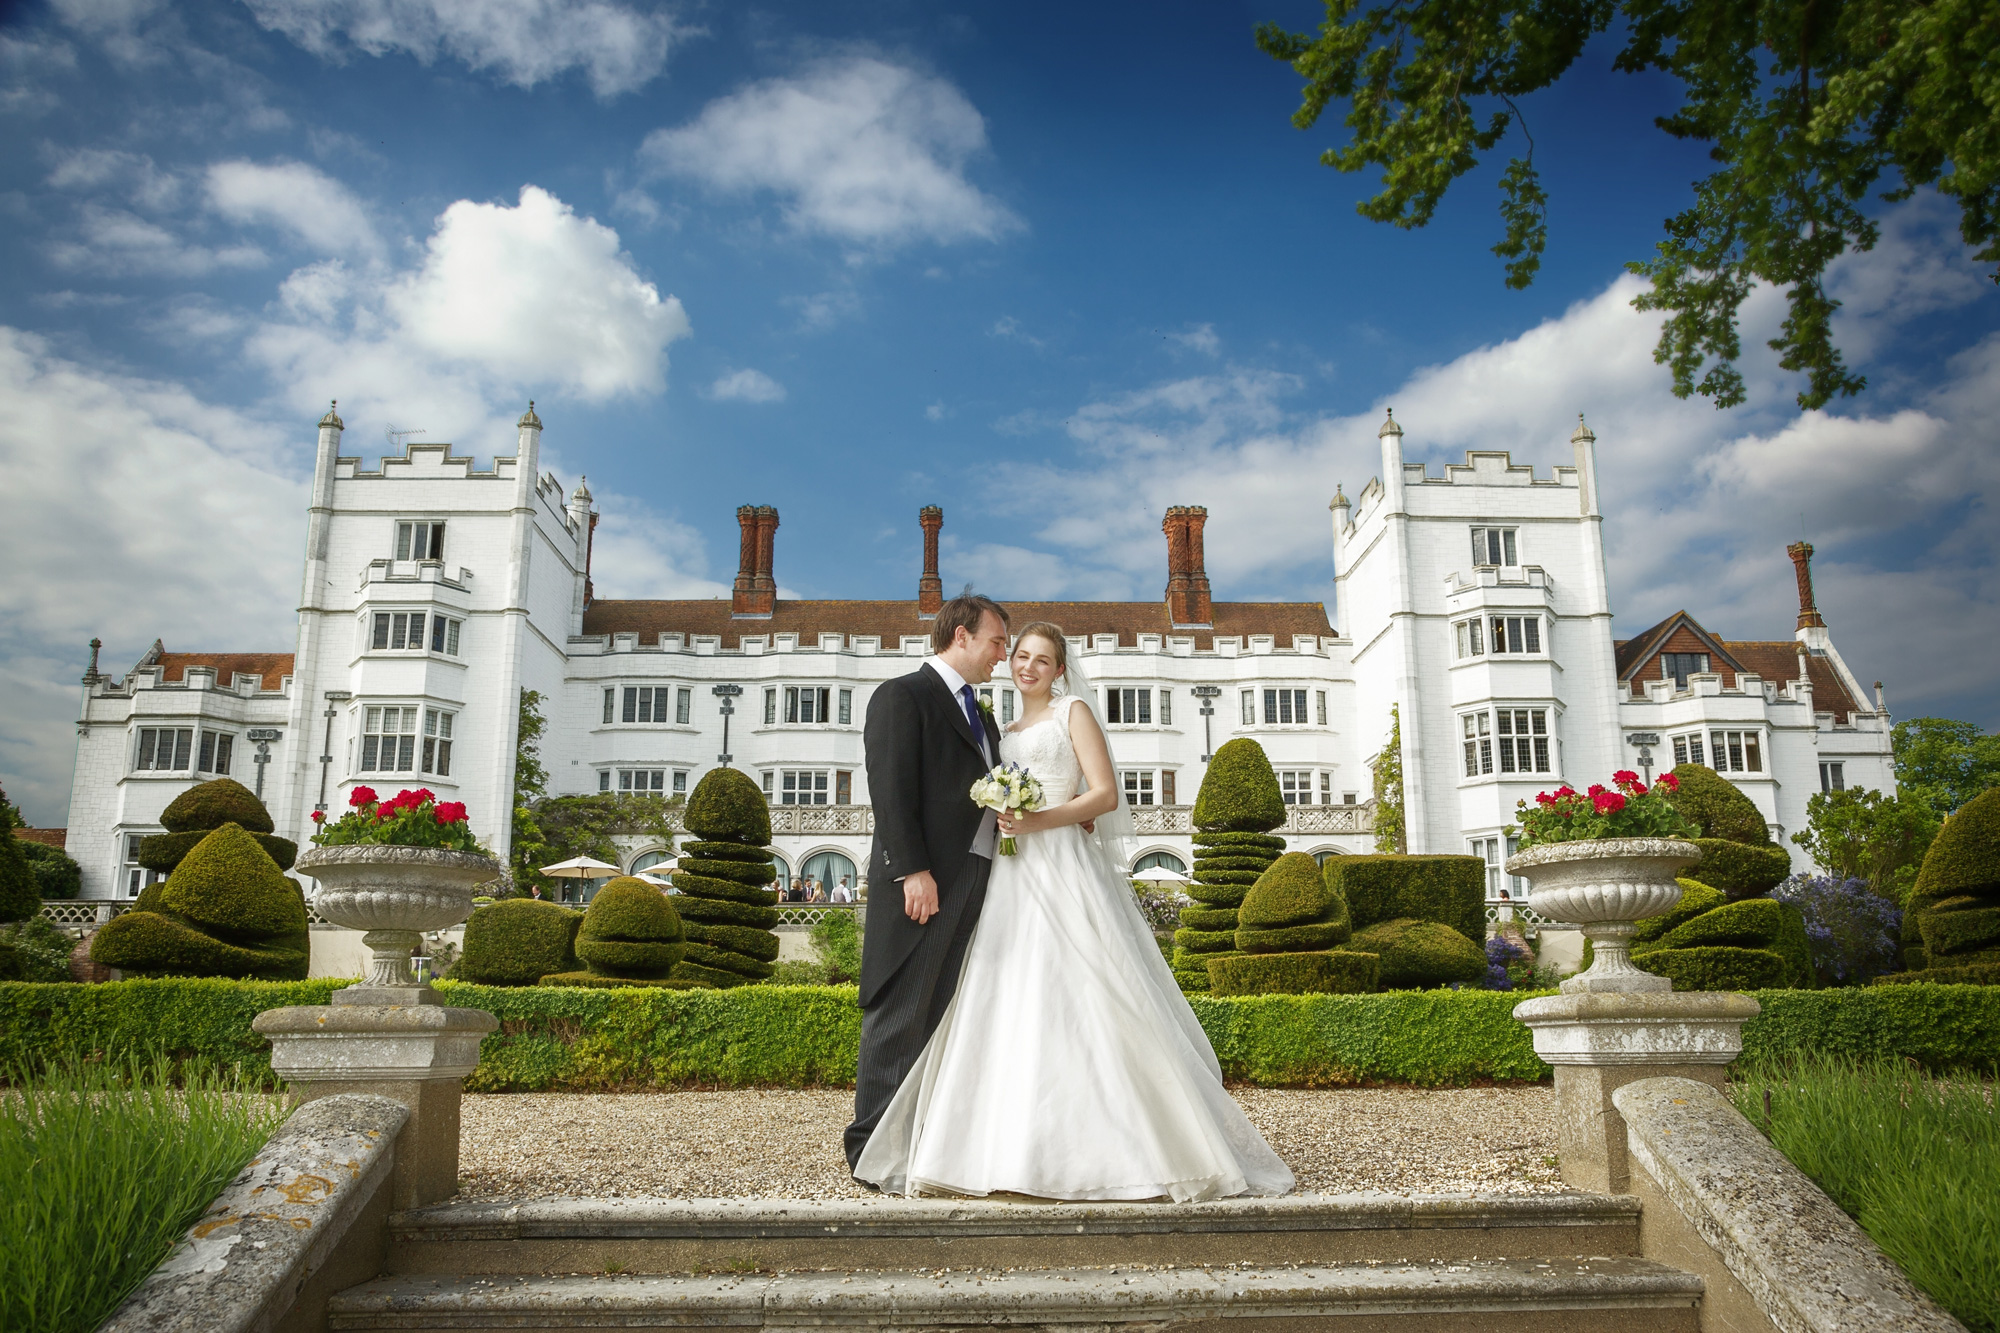 Adam_Hillier_Wedding_Photographer_Newbury_Berkshire_1 (9).jpg